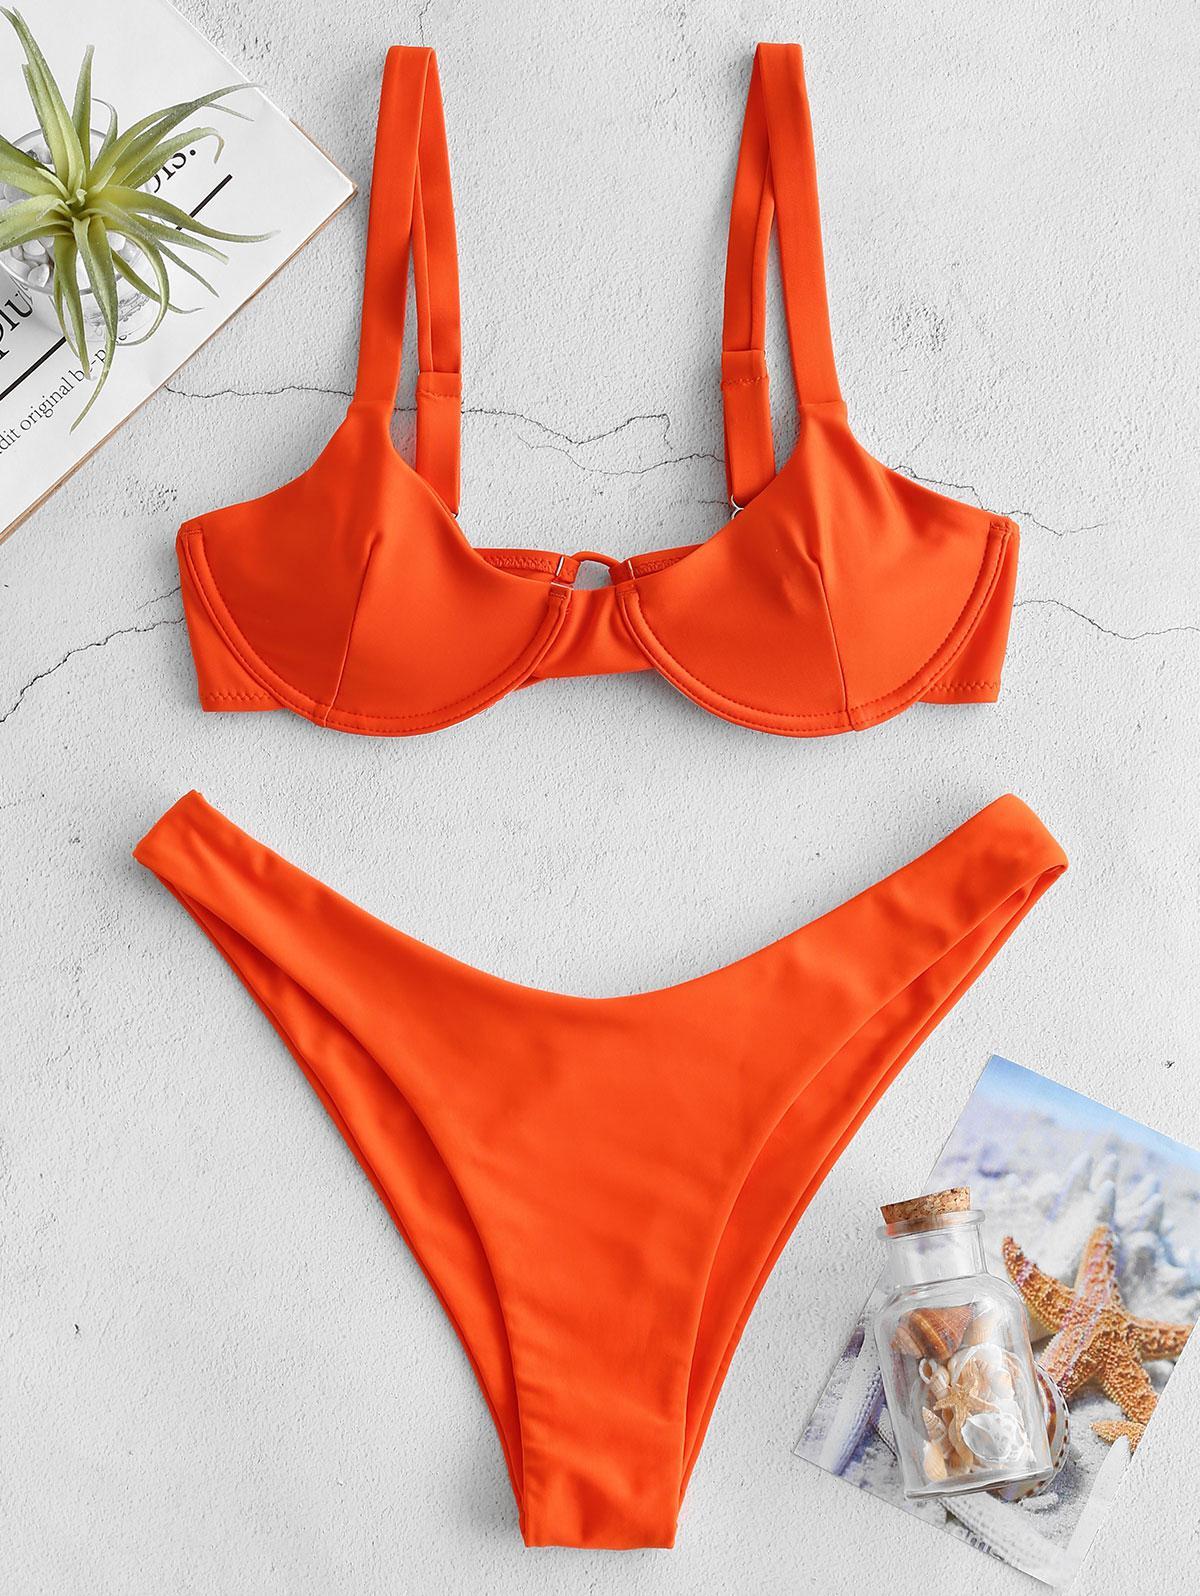 ZAFUL Underwire Tie Balconette Bikini Set thumbnail